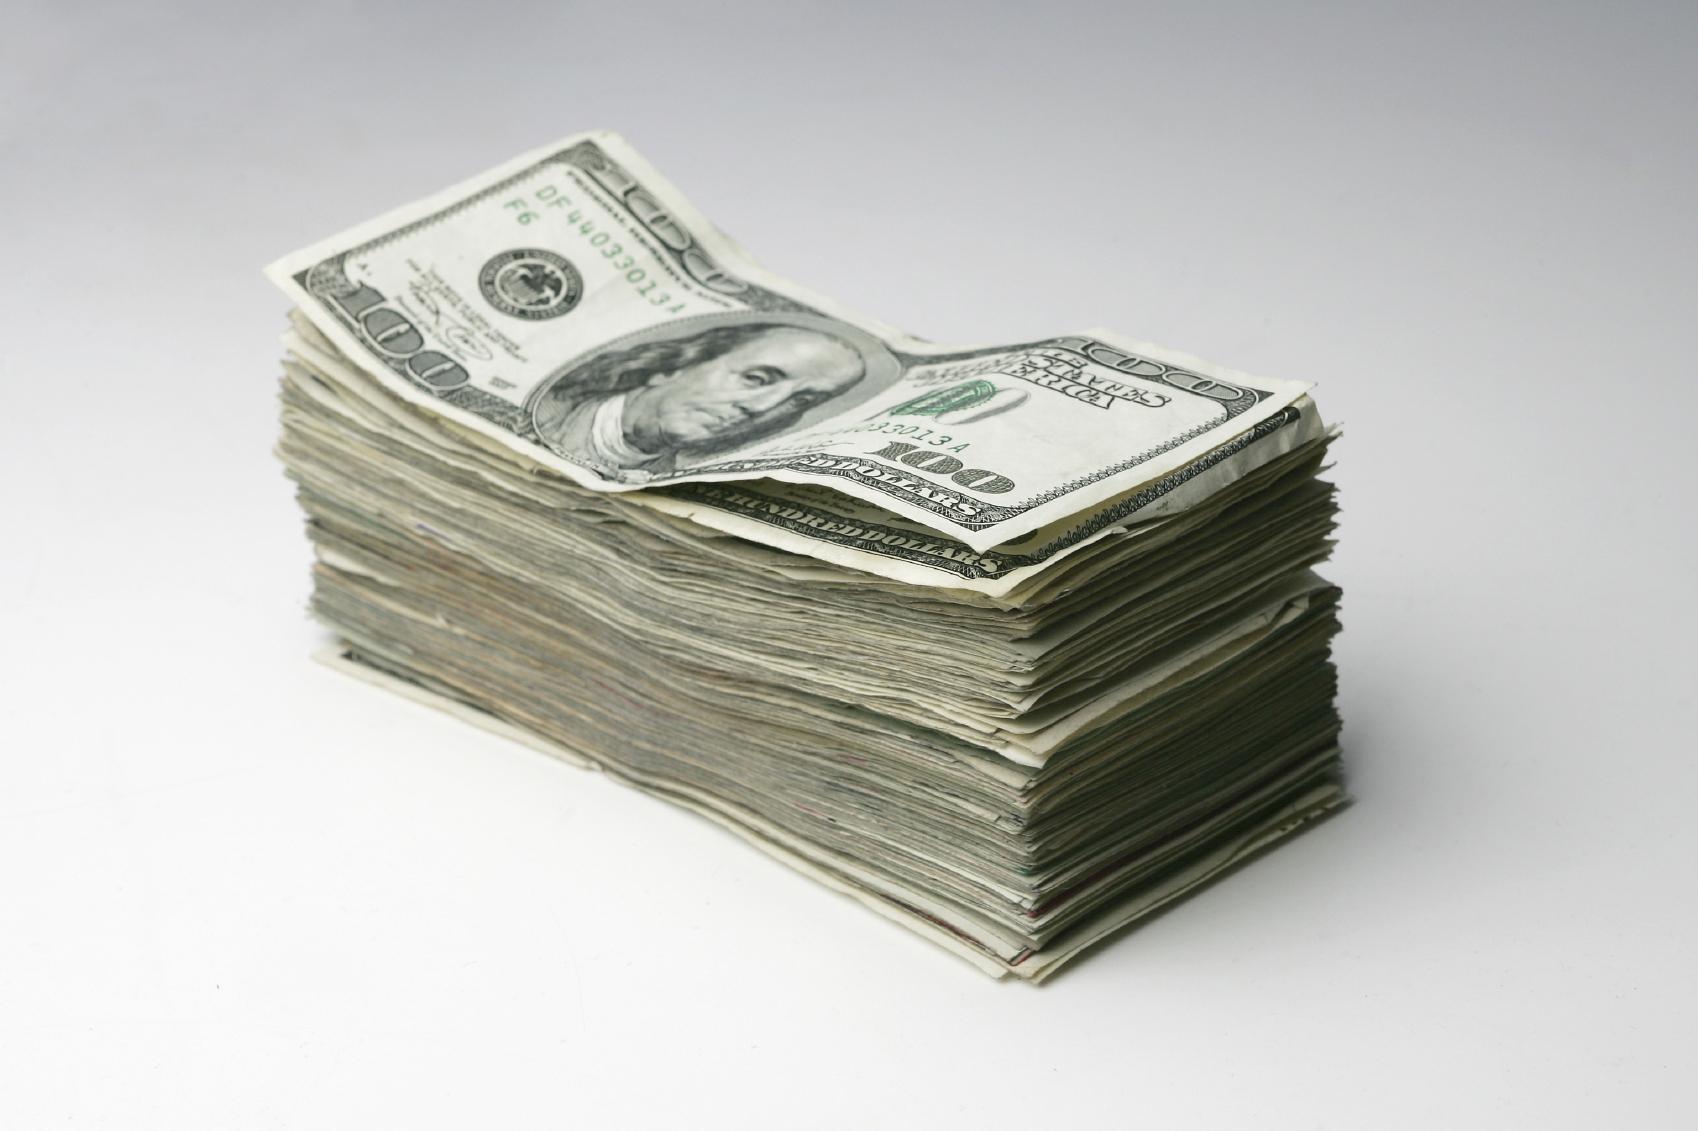 Publix Christmas Bonus Date 2020 These Employees Got a $100,000 Christmas Bonus   Money